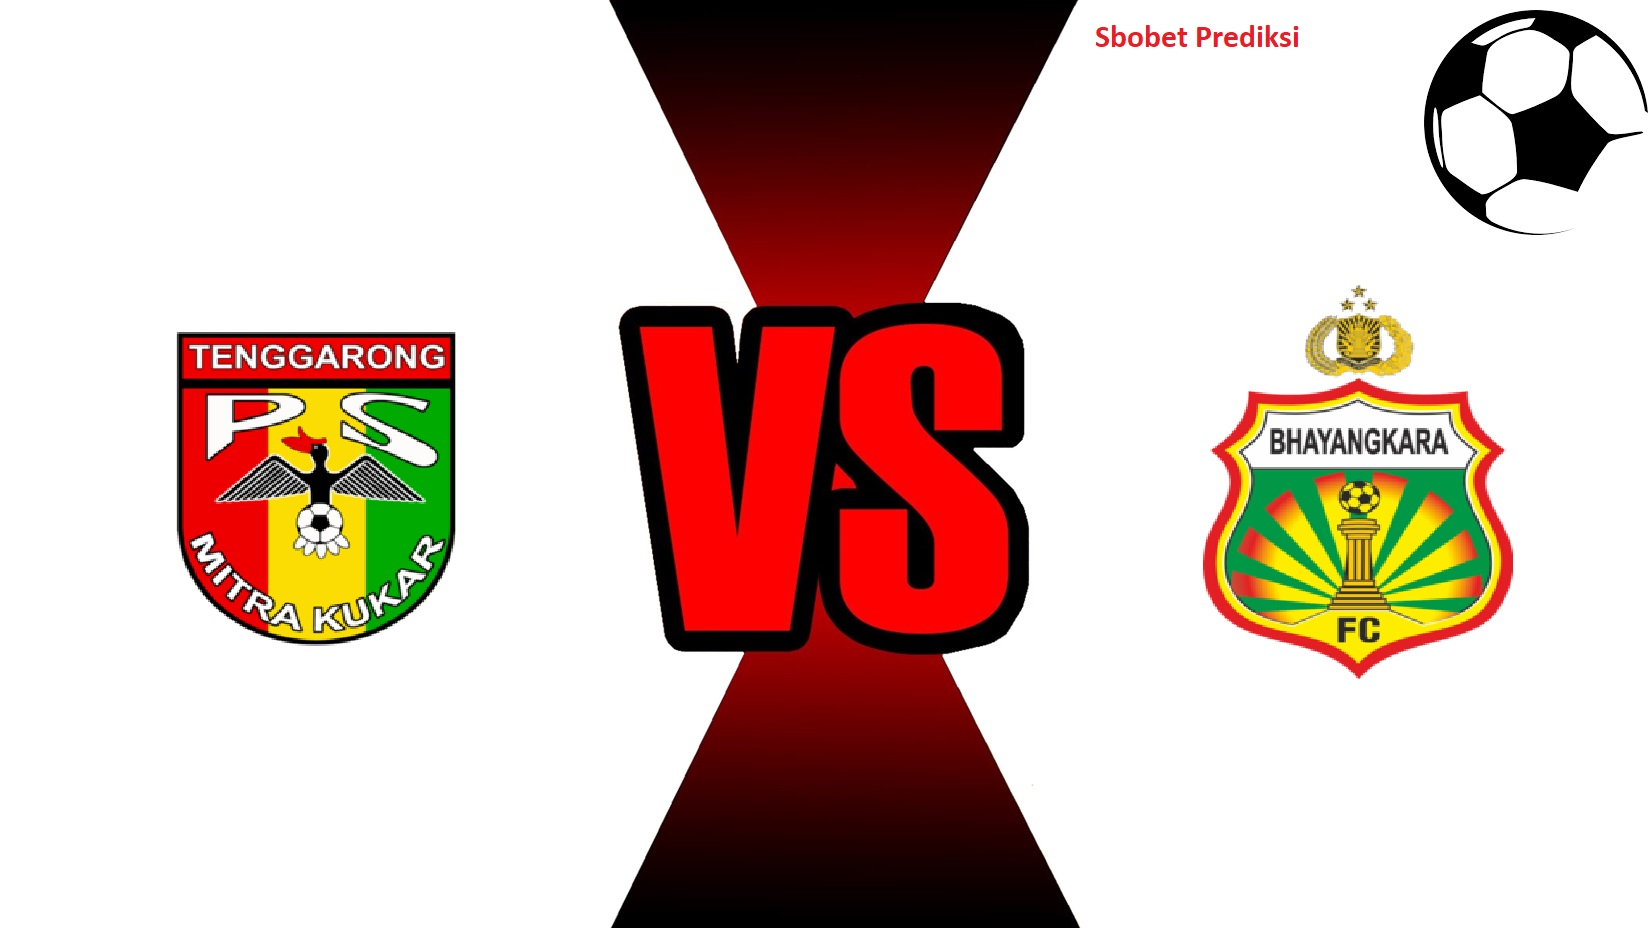 Prediksi Skor Pertandingan Mitra Kukar vs Bhayangkara 19 Oktober 2018